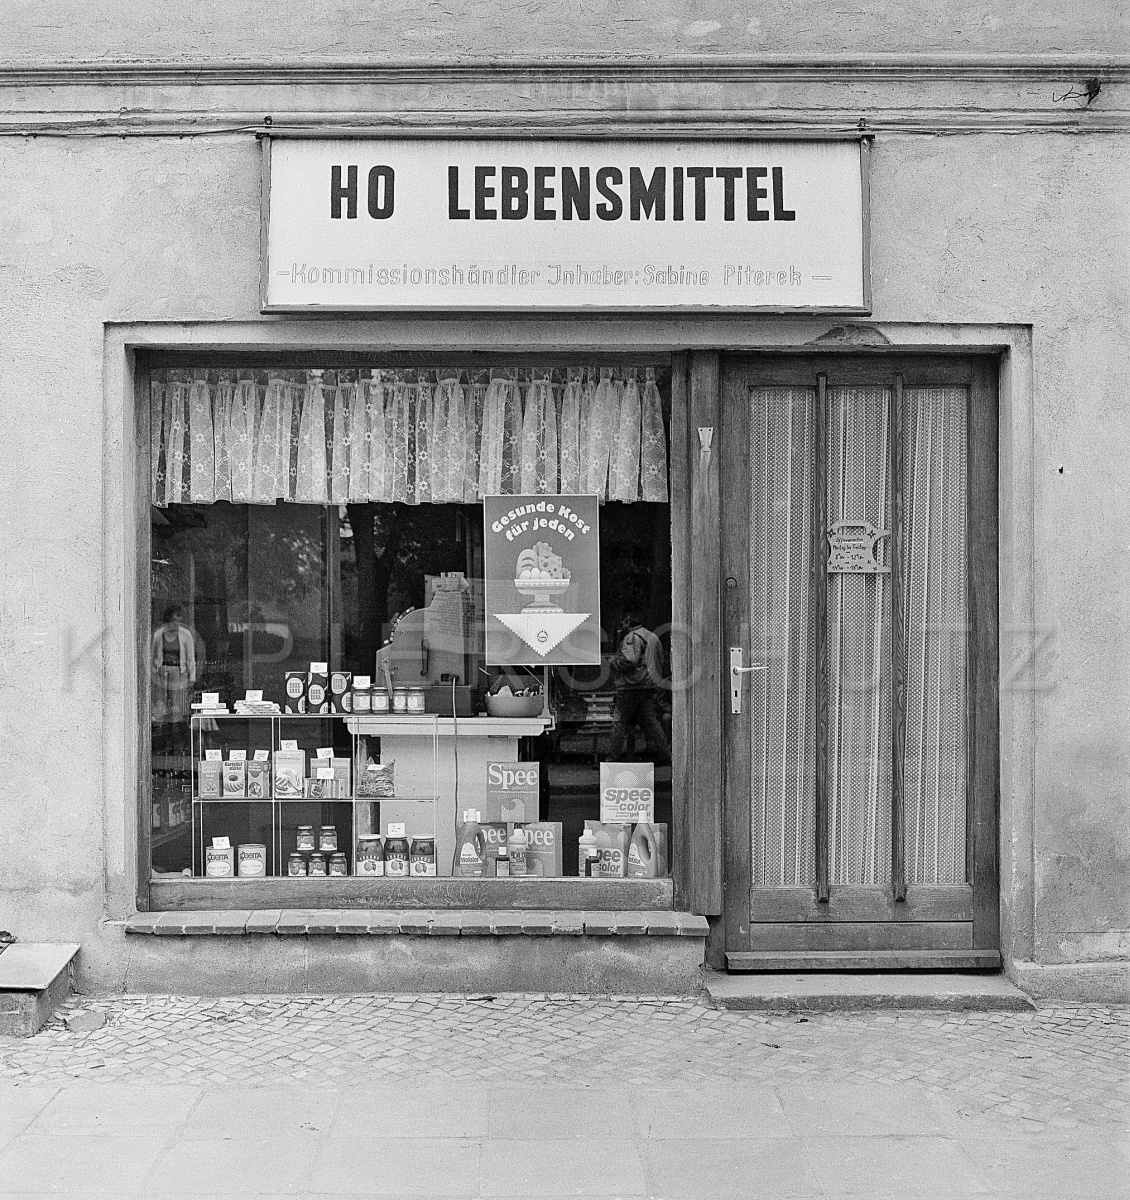 HO Lebensmittel LadenInhaberin Sabine Piterek